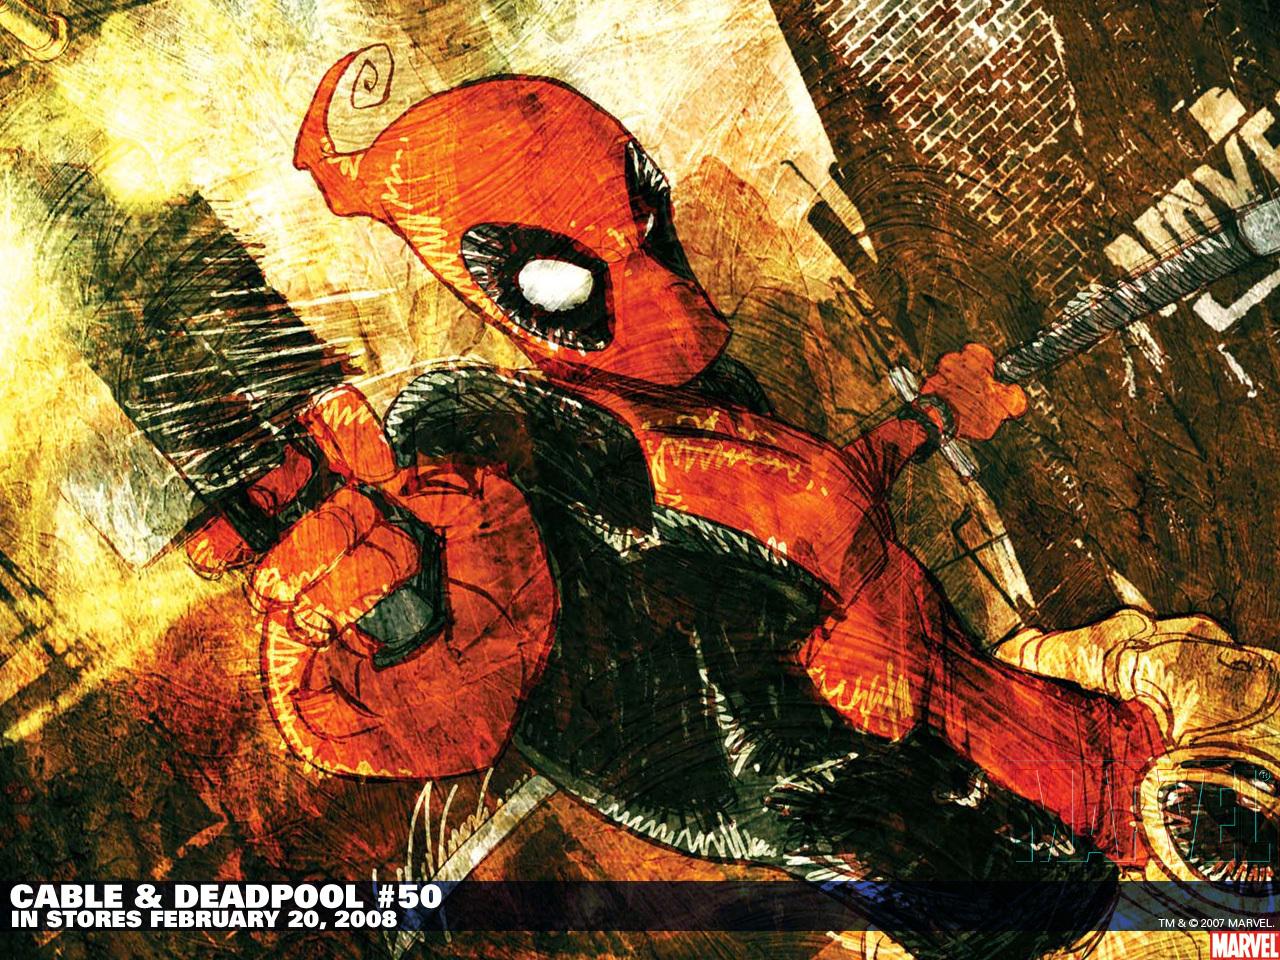 Batman Wallpaper Hd 1920x1080 Deadpool Wallpaper Deadpool Wallpaper 10619221 Fanpop